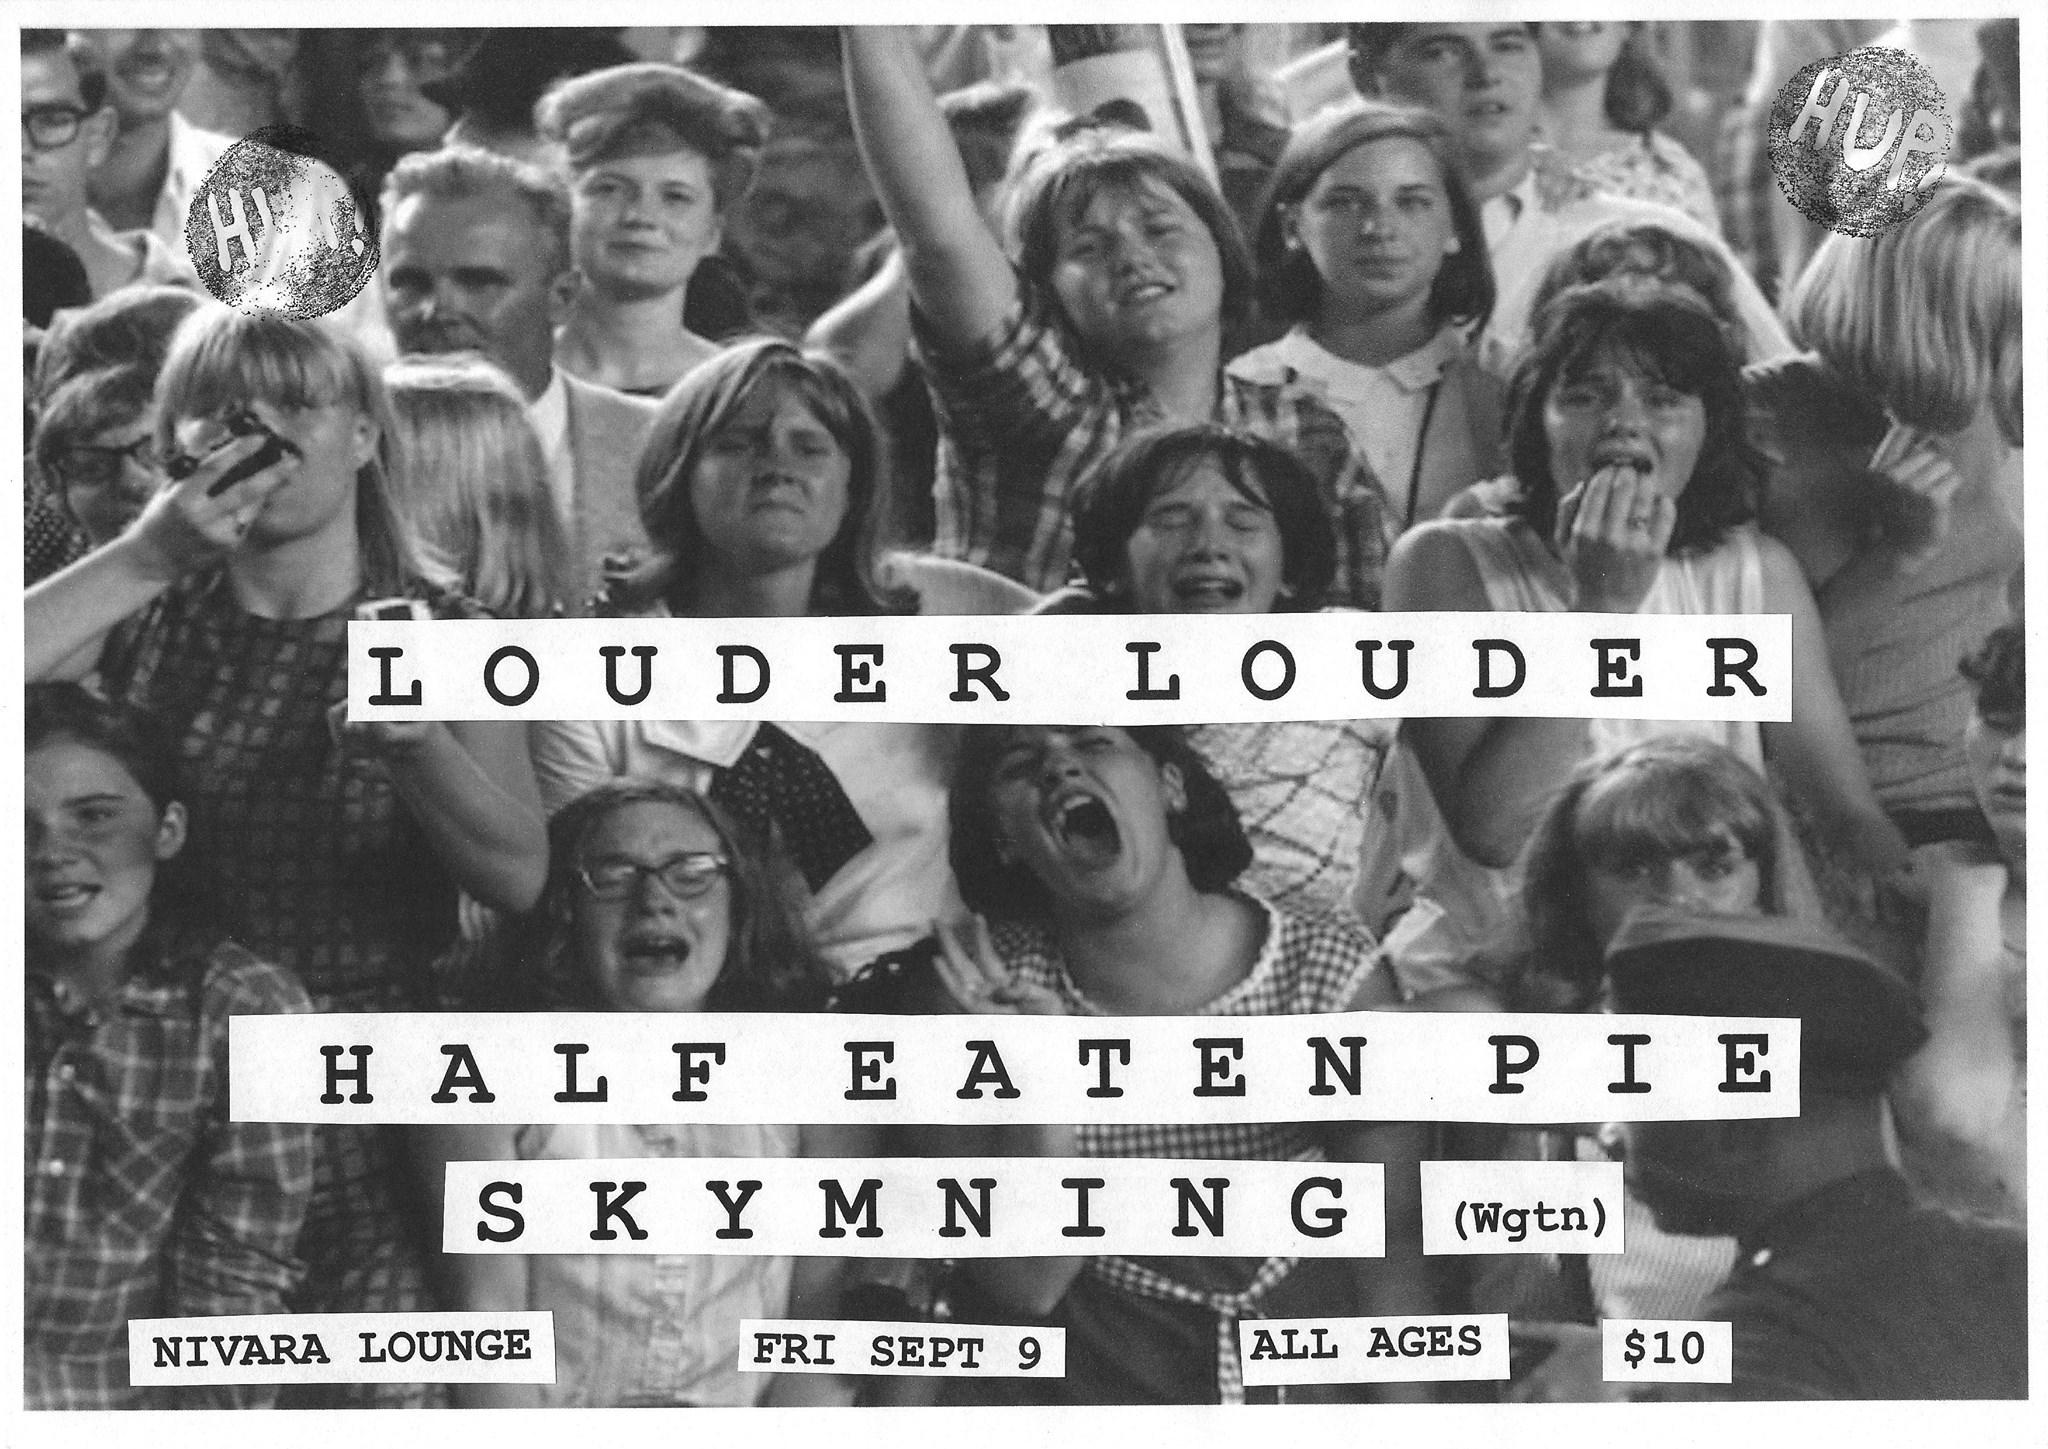 Louder Louder, Half Eaten Pie and Skymning